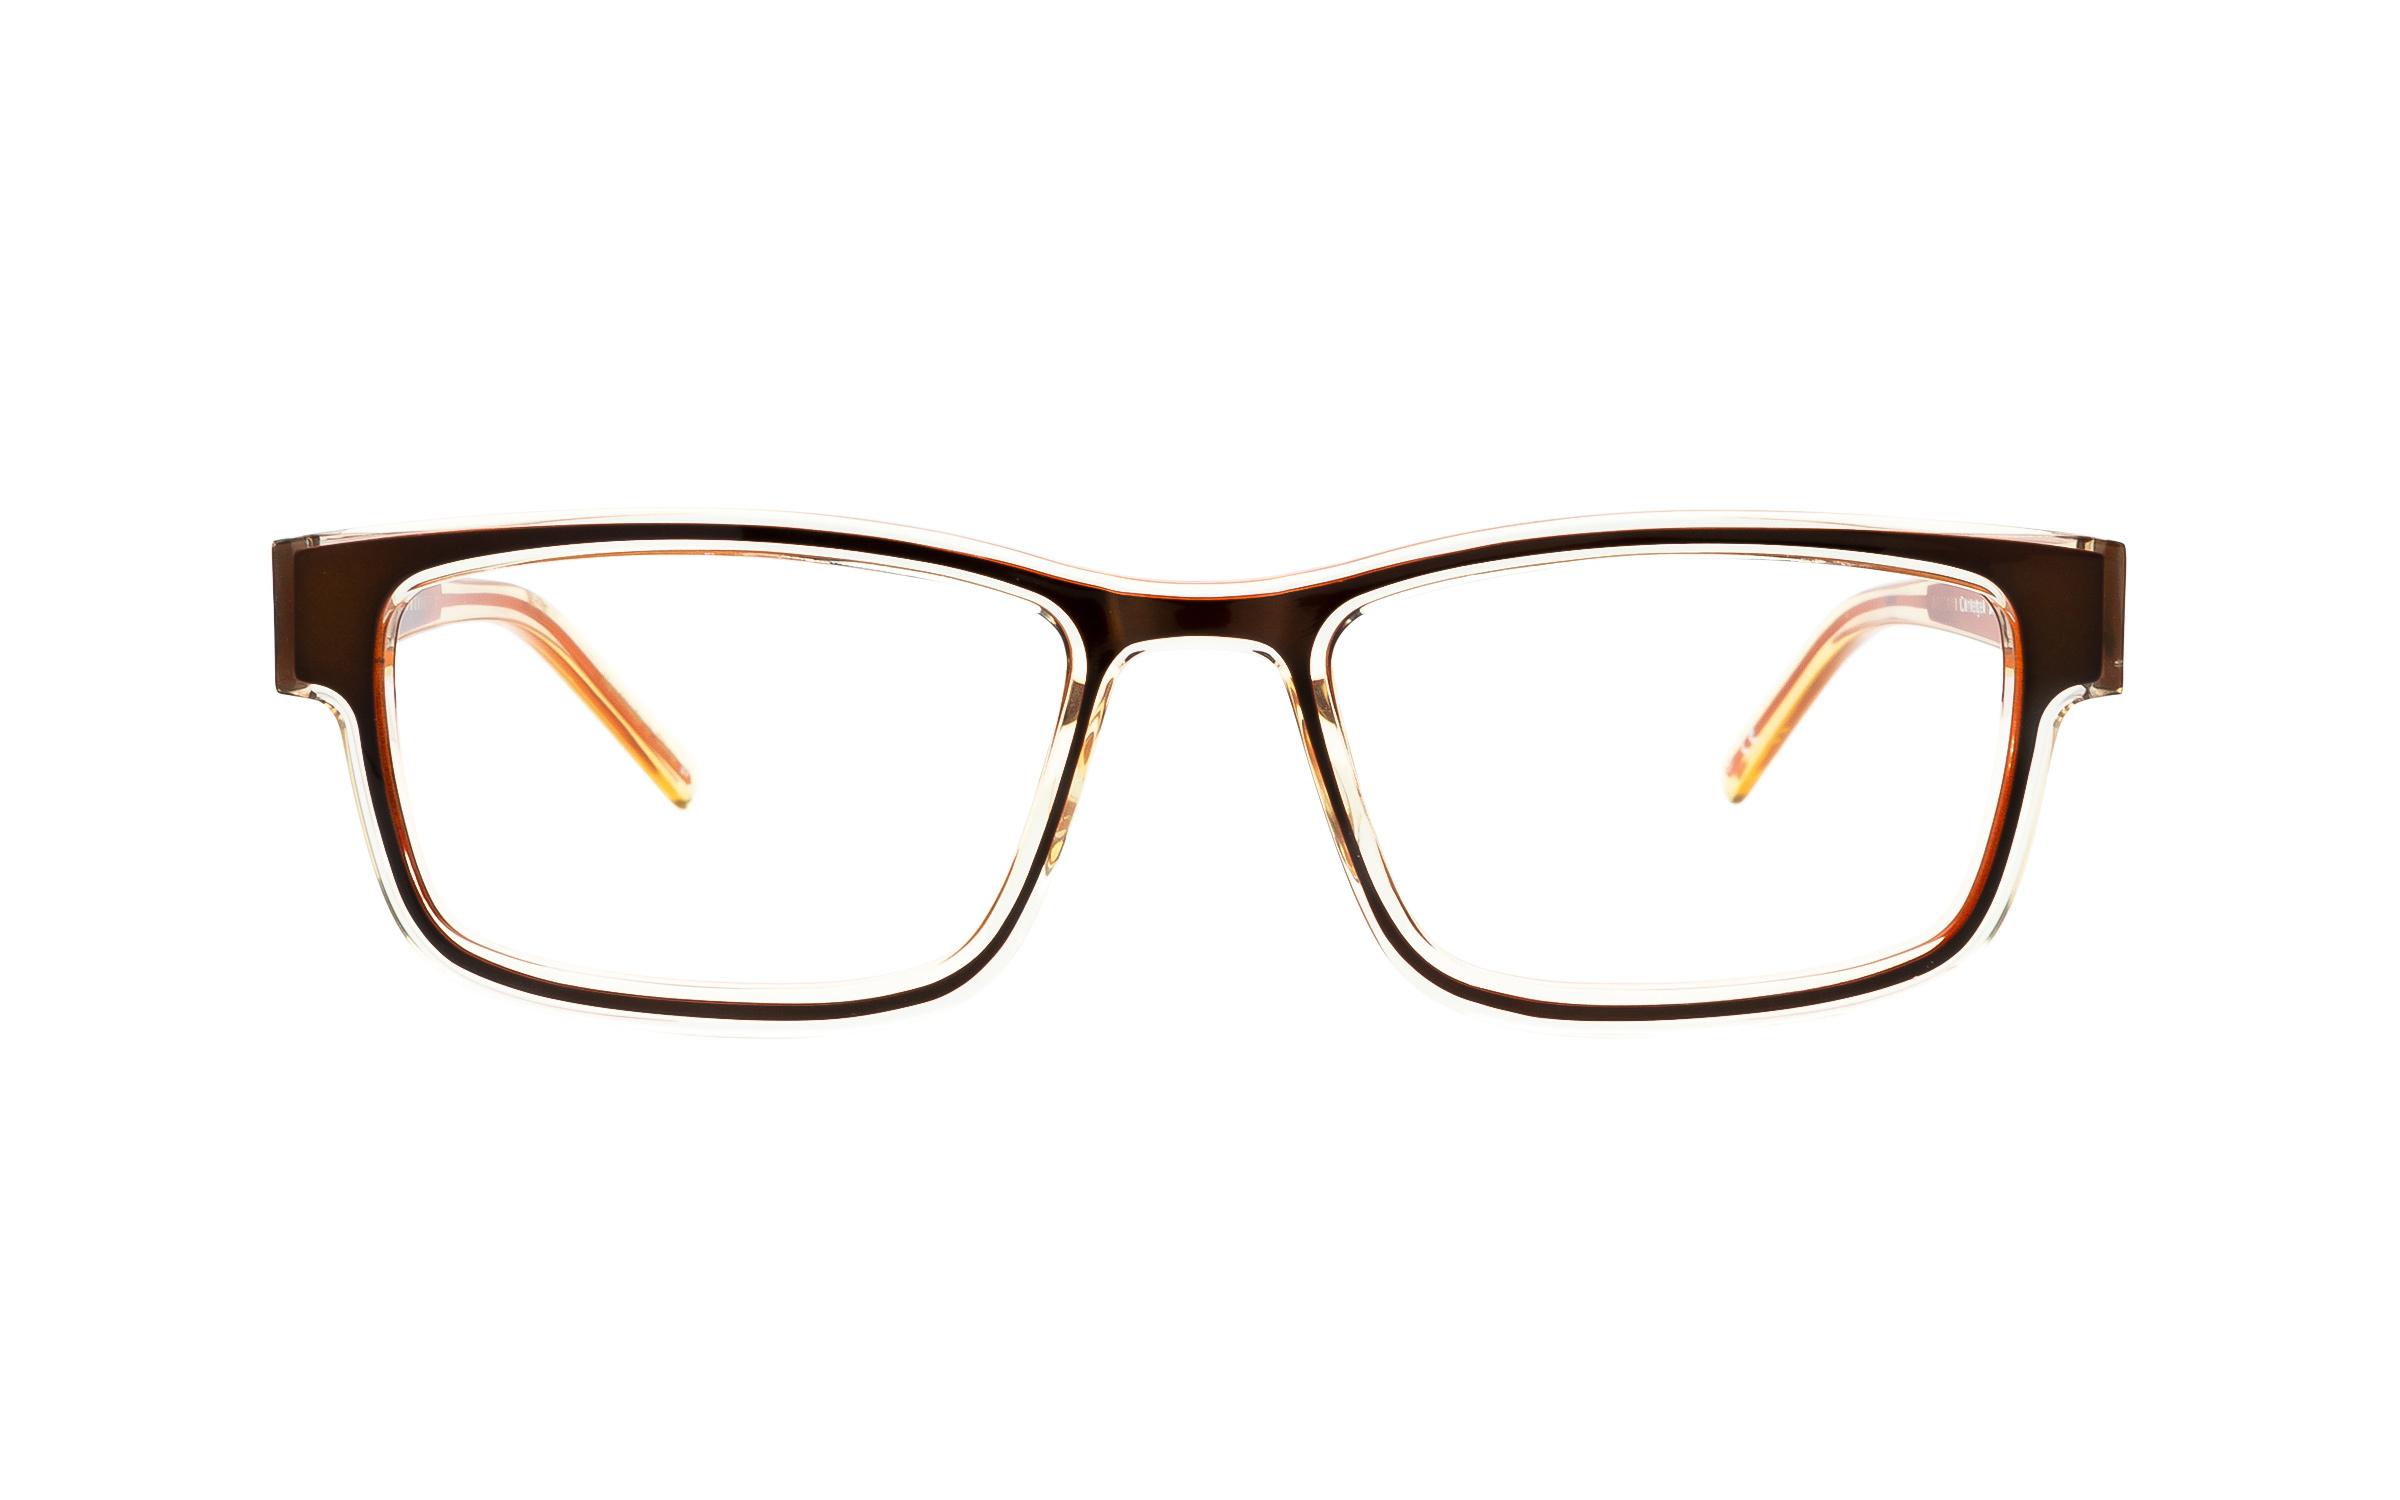 http://www.coastal.com/ - Jhane Barnes Converge BR (54) Eyeglasses and Frame in Brown | Acetate – Online Coastal